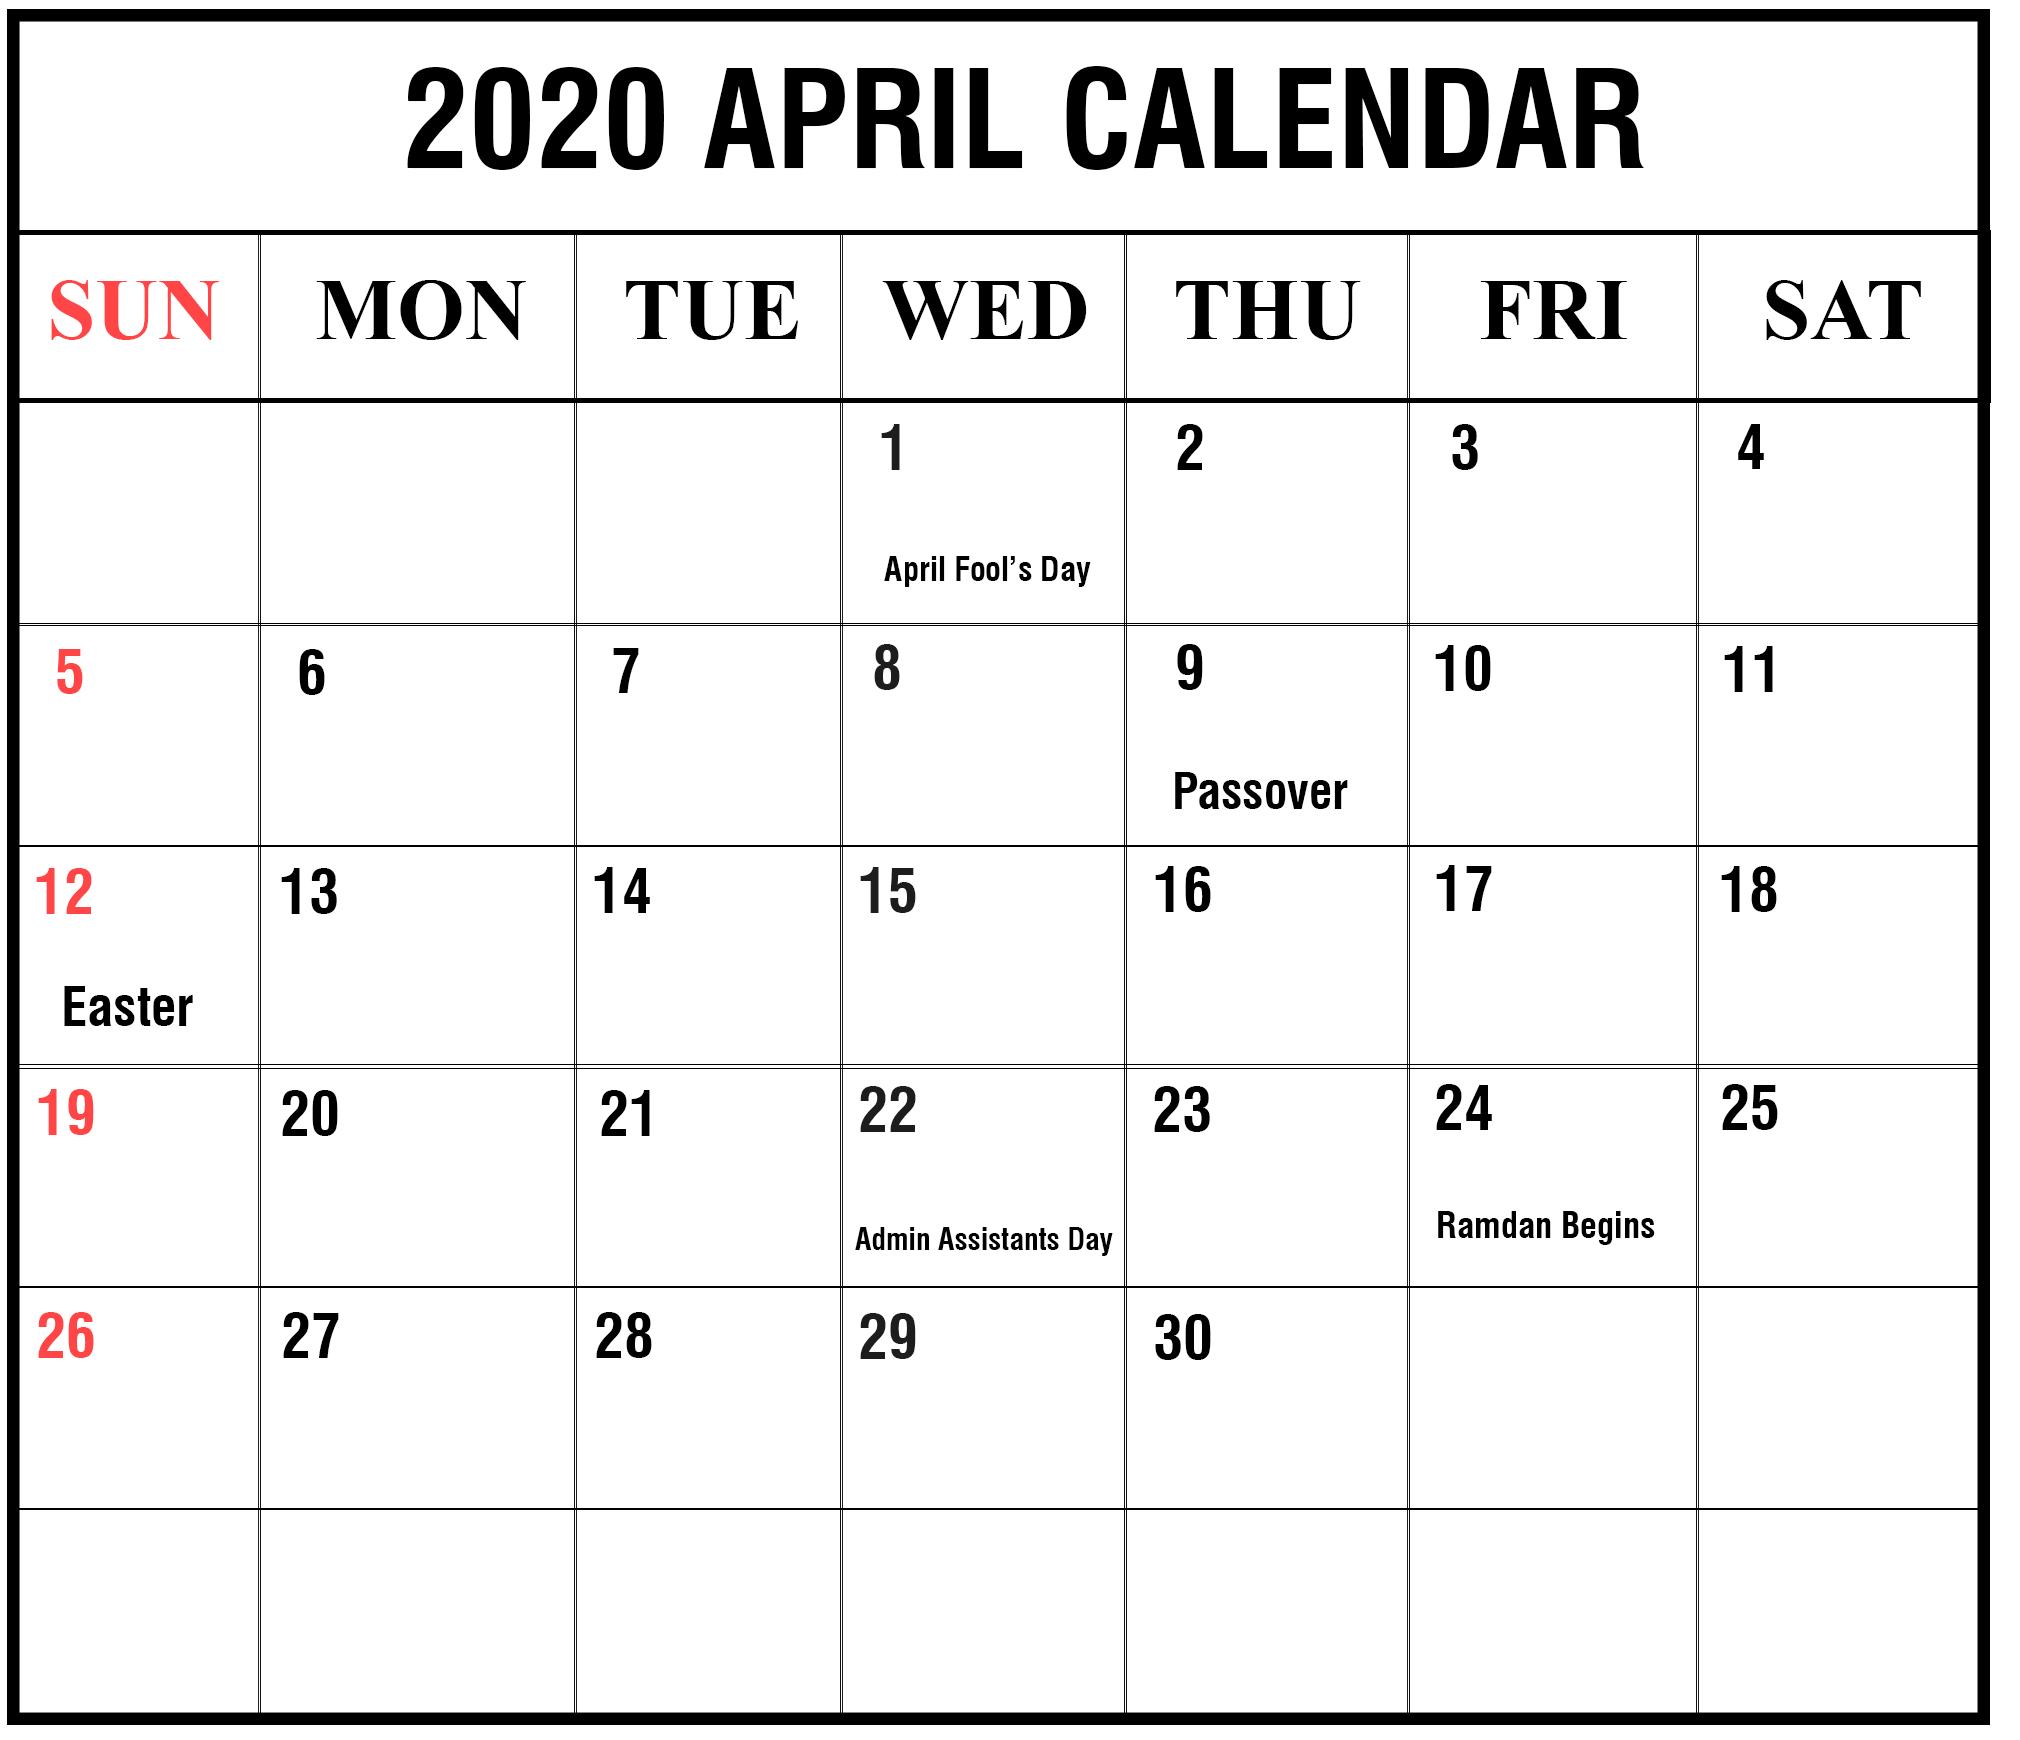 April 2020 Holidays Calendar Usa Uk Canada India Australia In